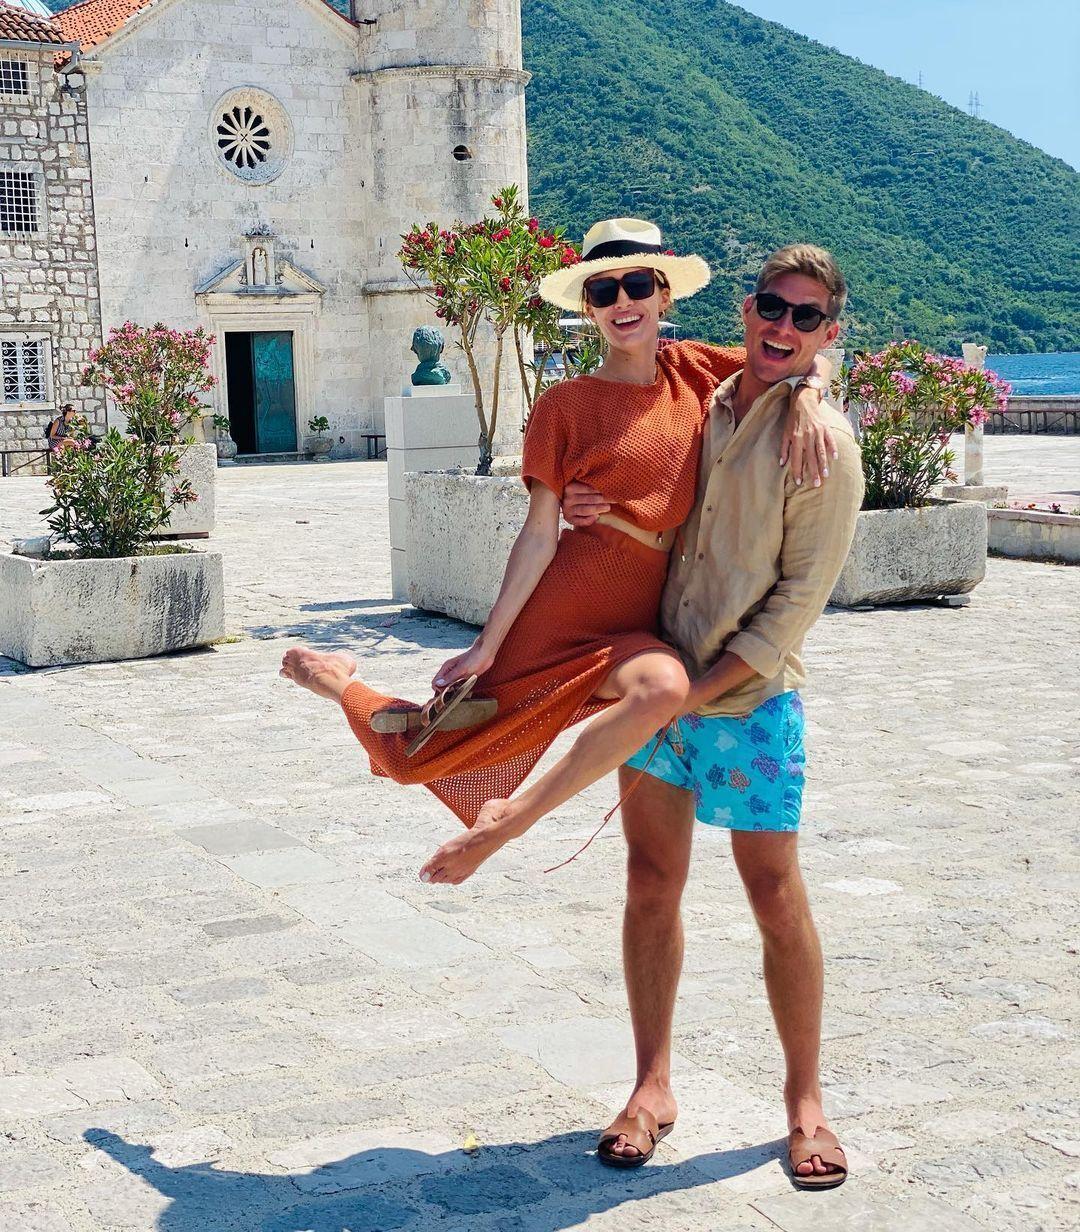 Остапчук с супругой на отдыхе.